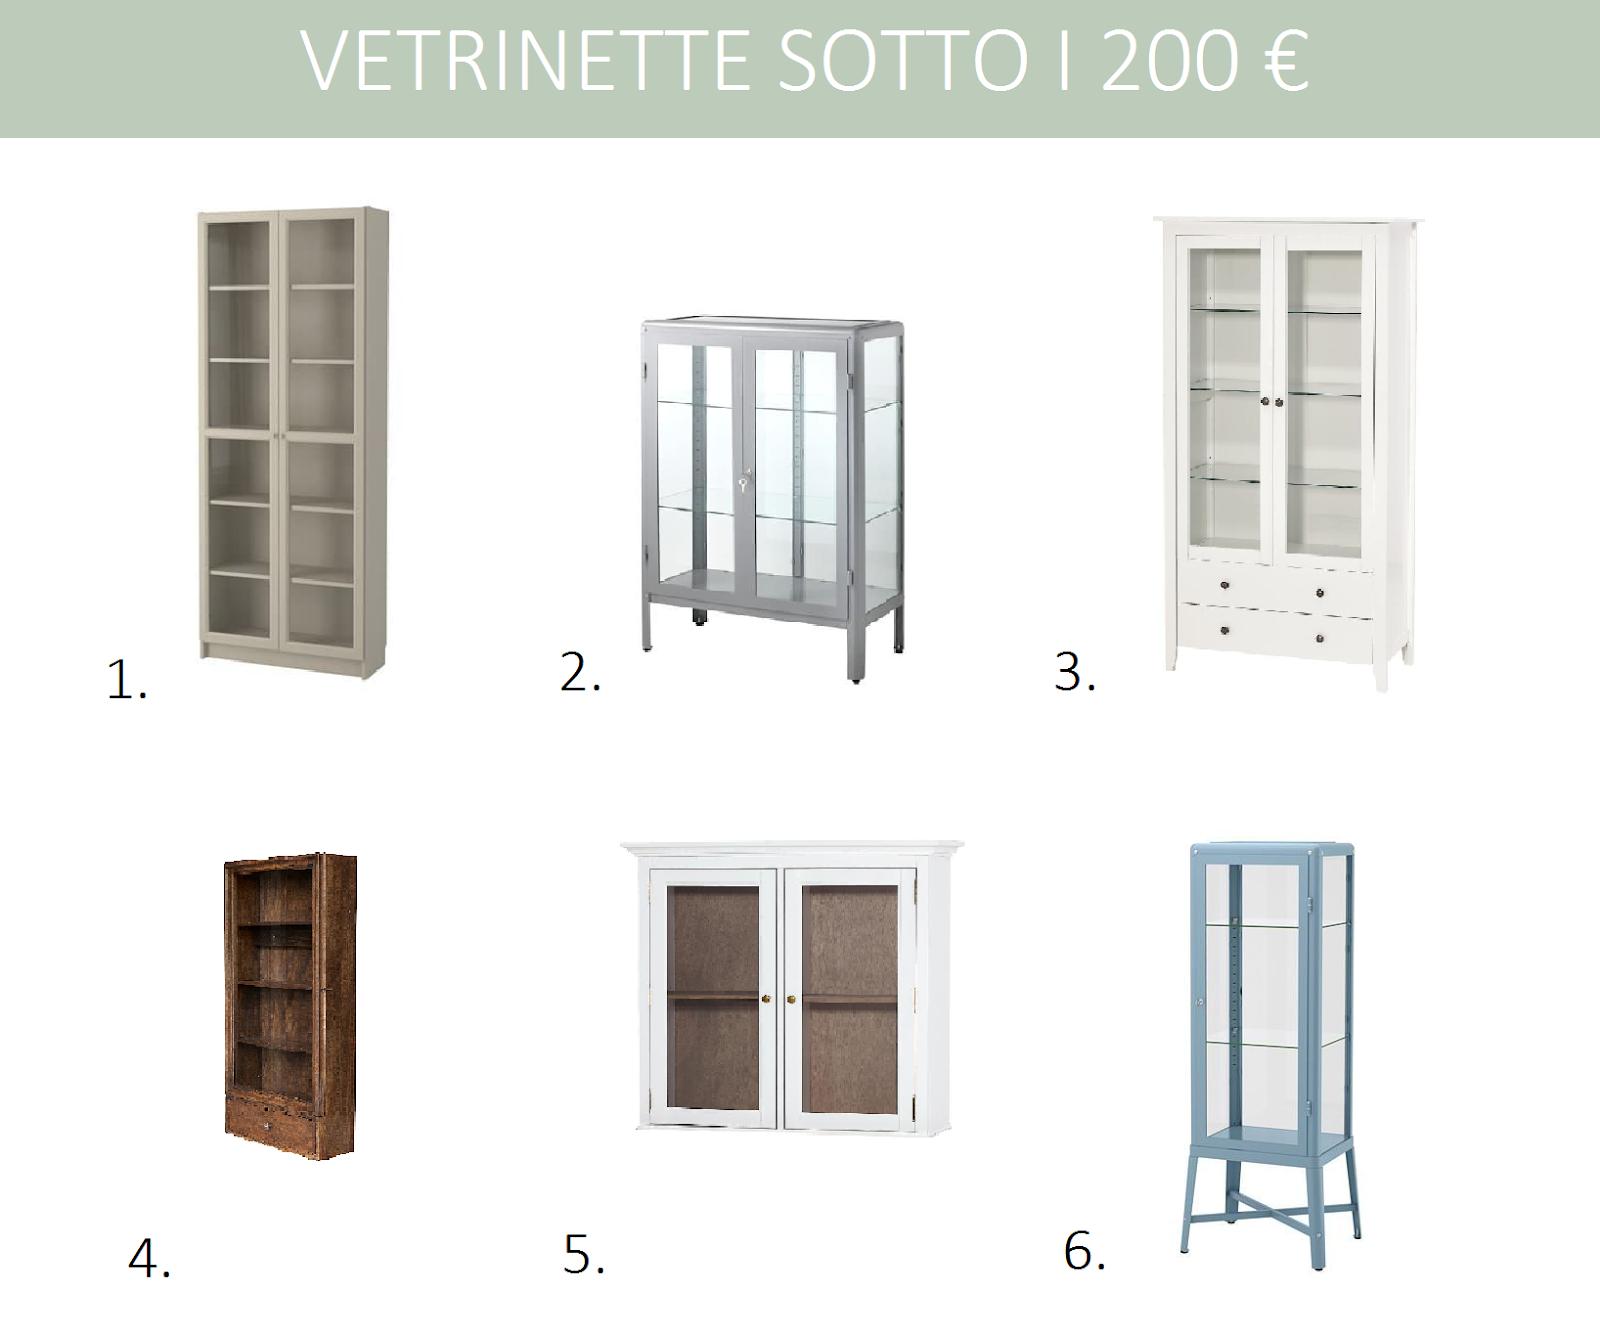 Idee blog arredamento part 2 for Ikea vetrinetta